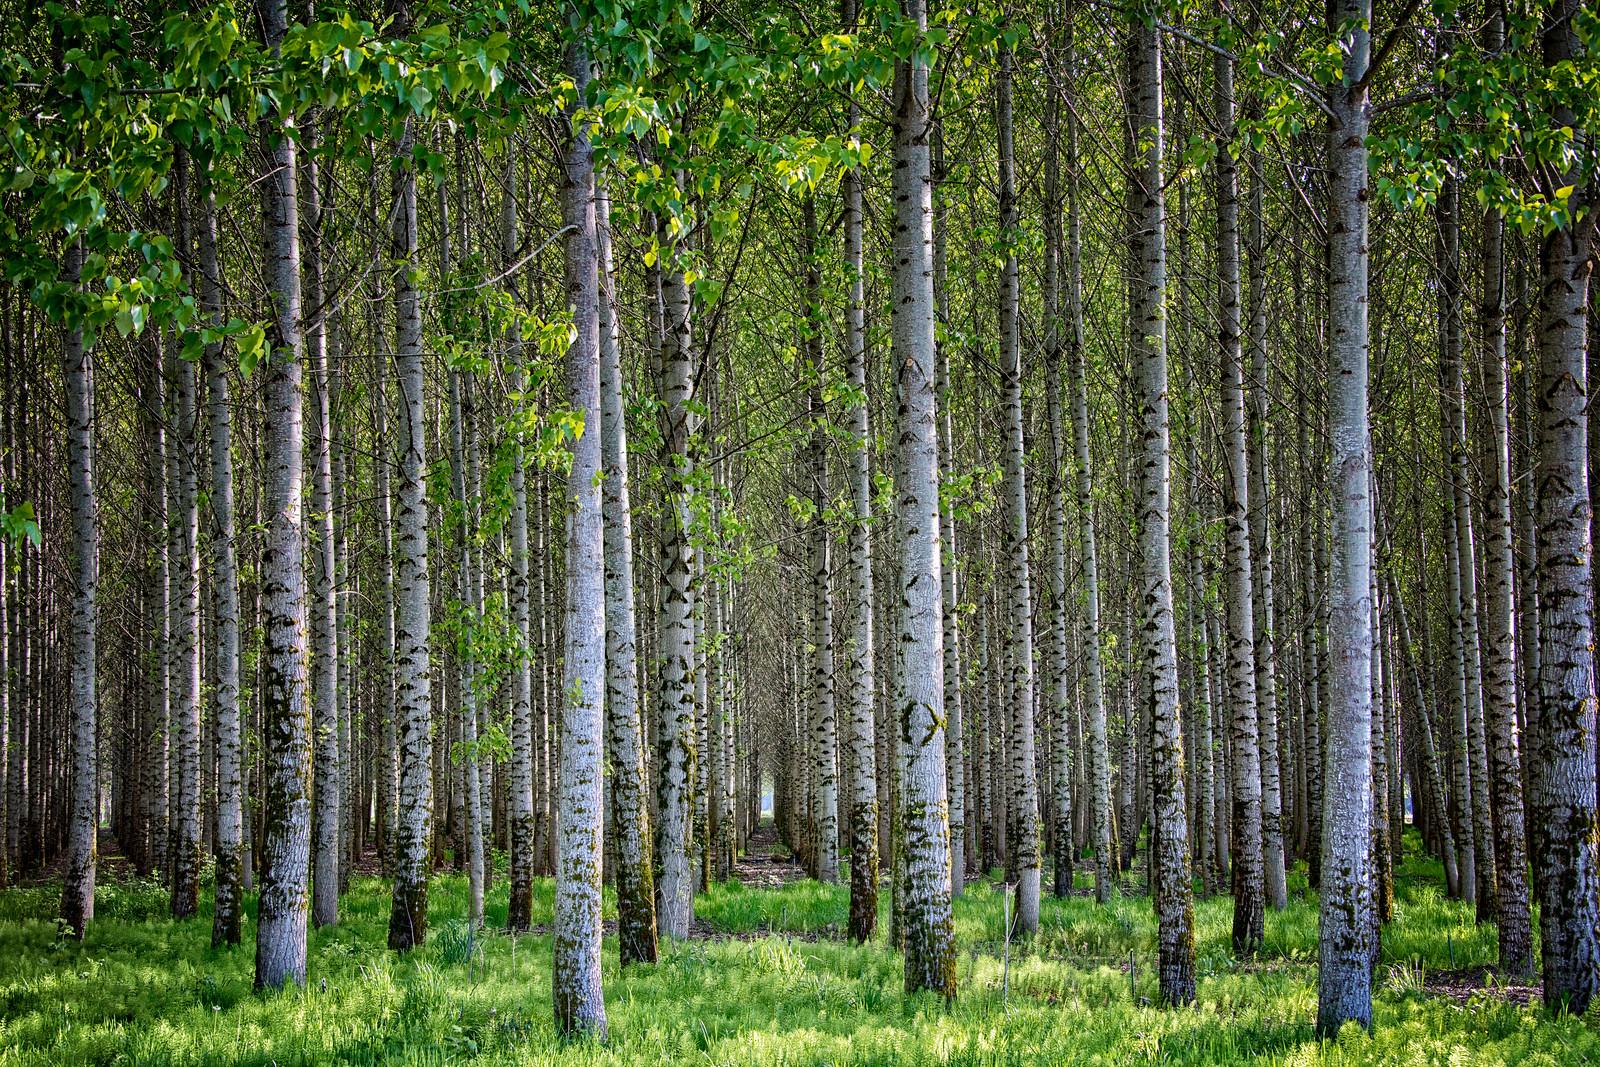 Chehalis Poplar Trees Tunnel